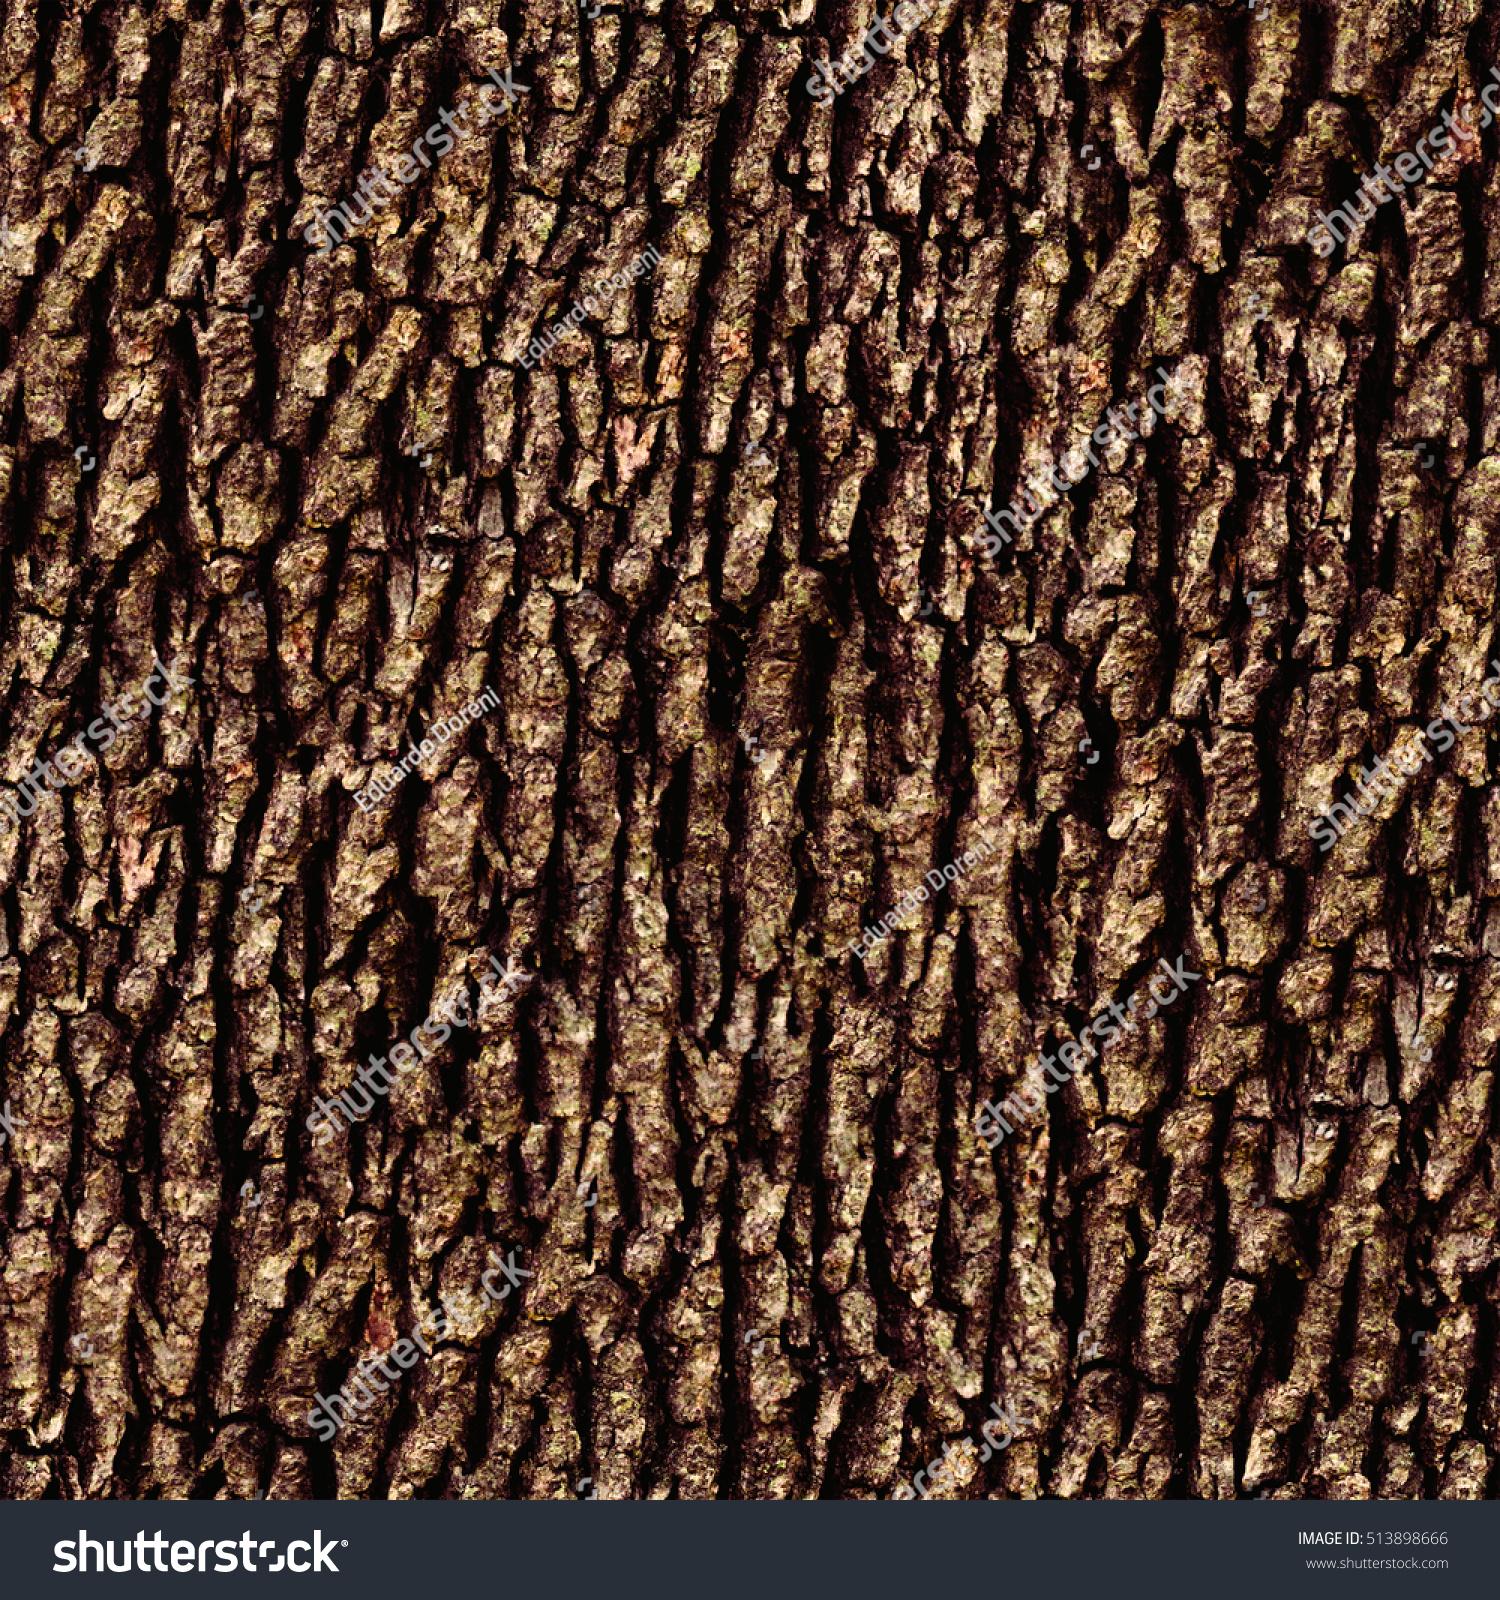 Natural Seamless Tree Bark Textures Stock Illustration 513898666 ...